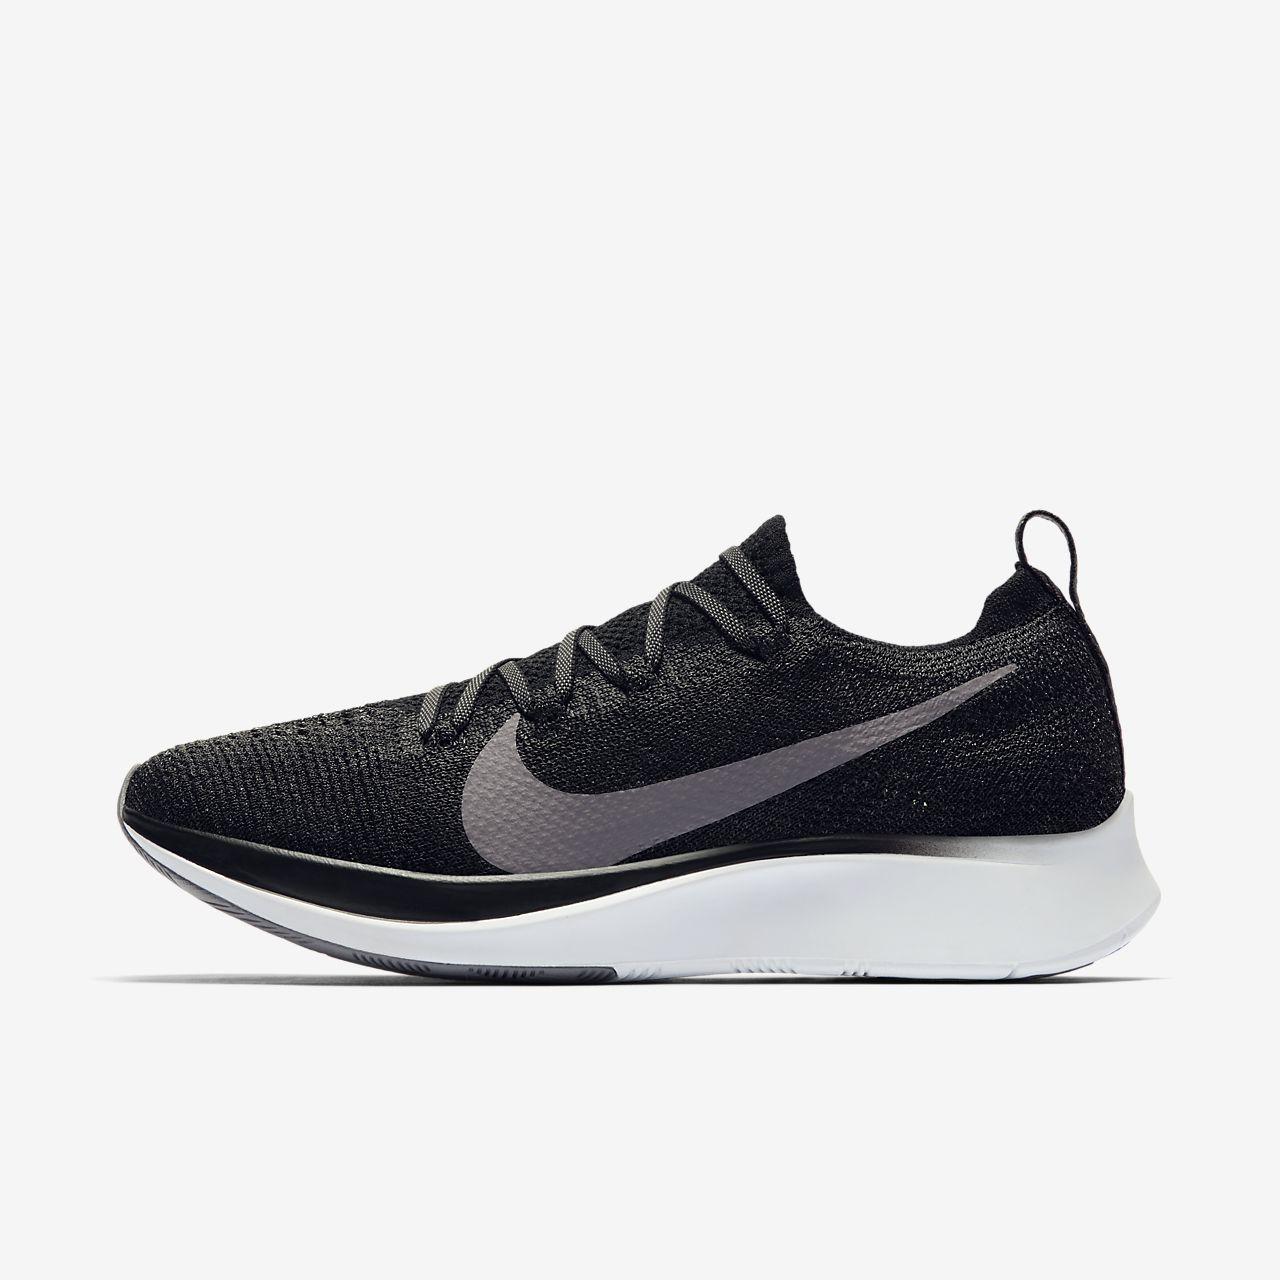 online retailer fad4a 6bee8 ... Chaussure de running Nike Zoom Fly Flyknit pour Femme